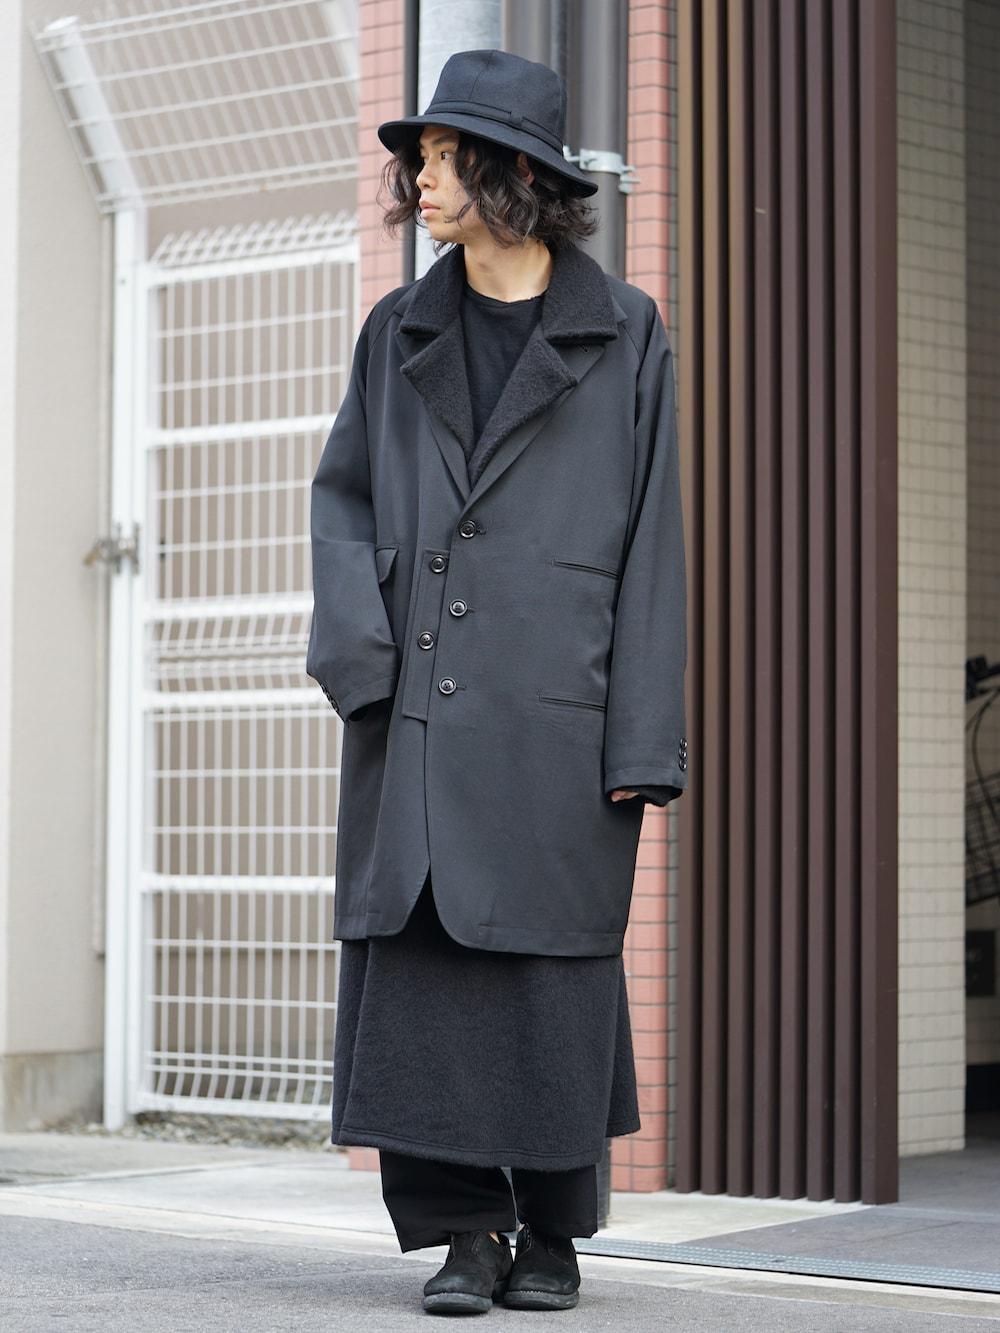 Yohji Yamamoto Coat On Jacket Style 01